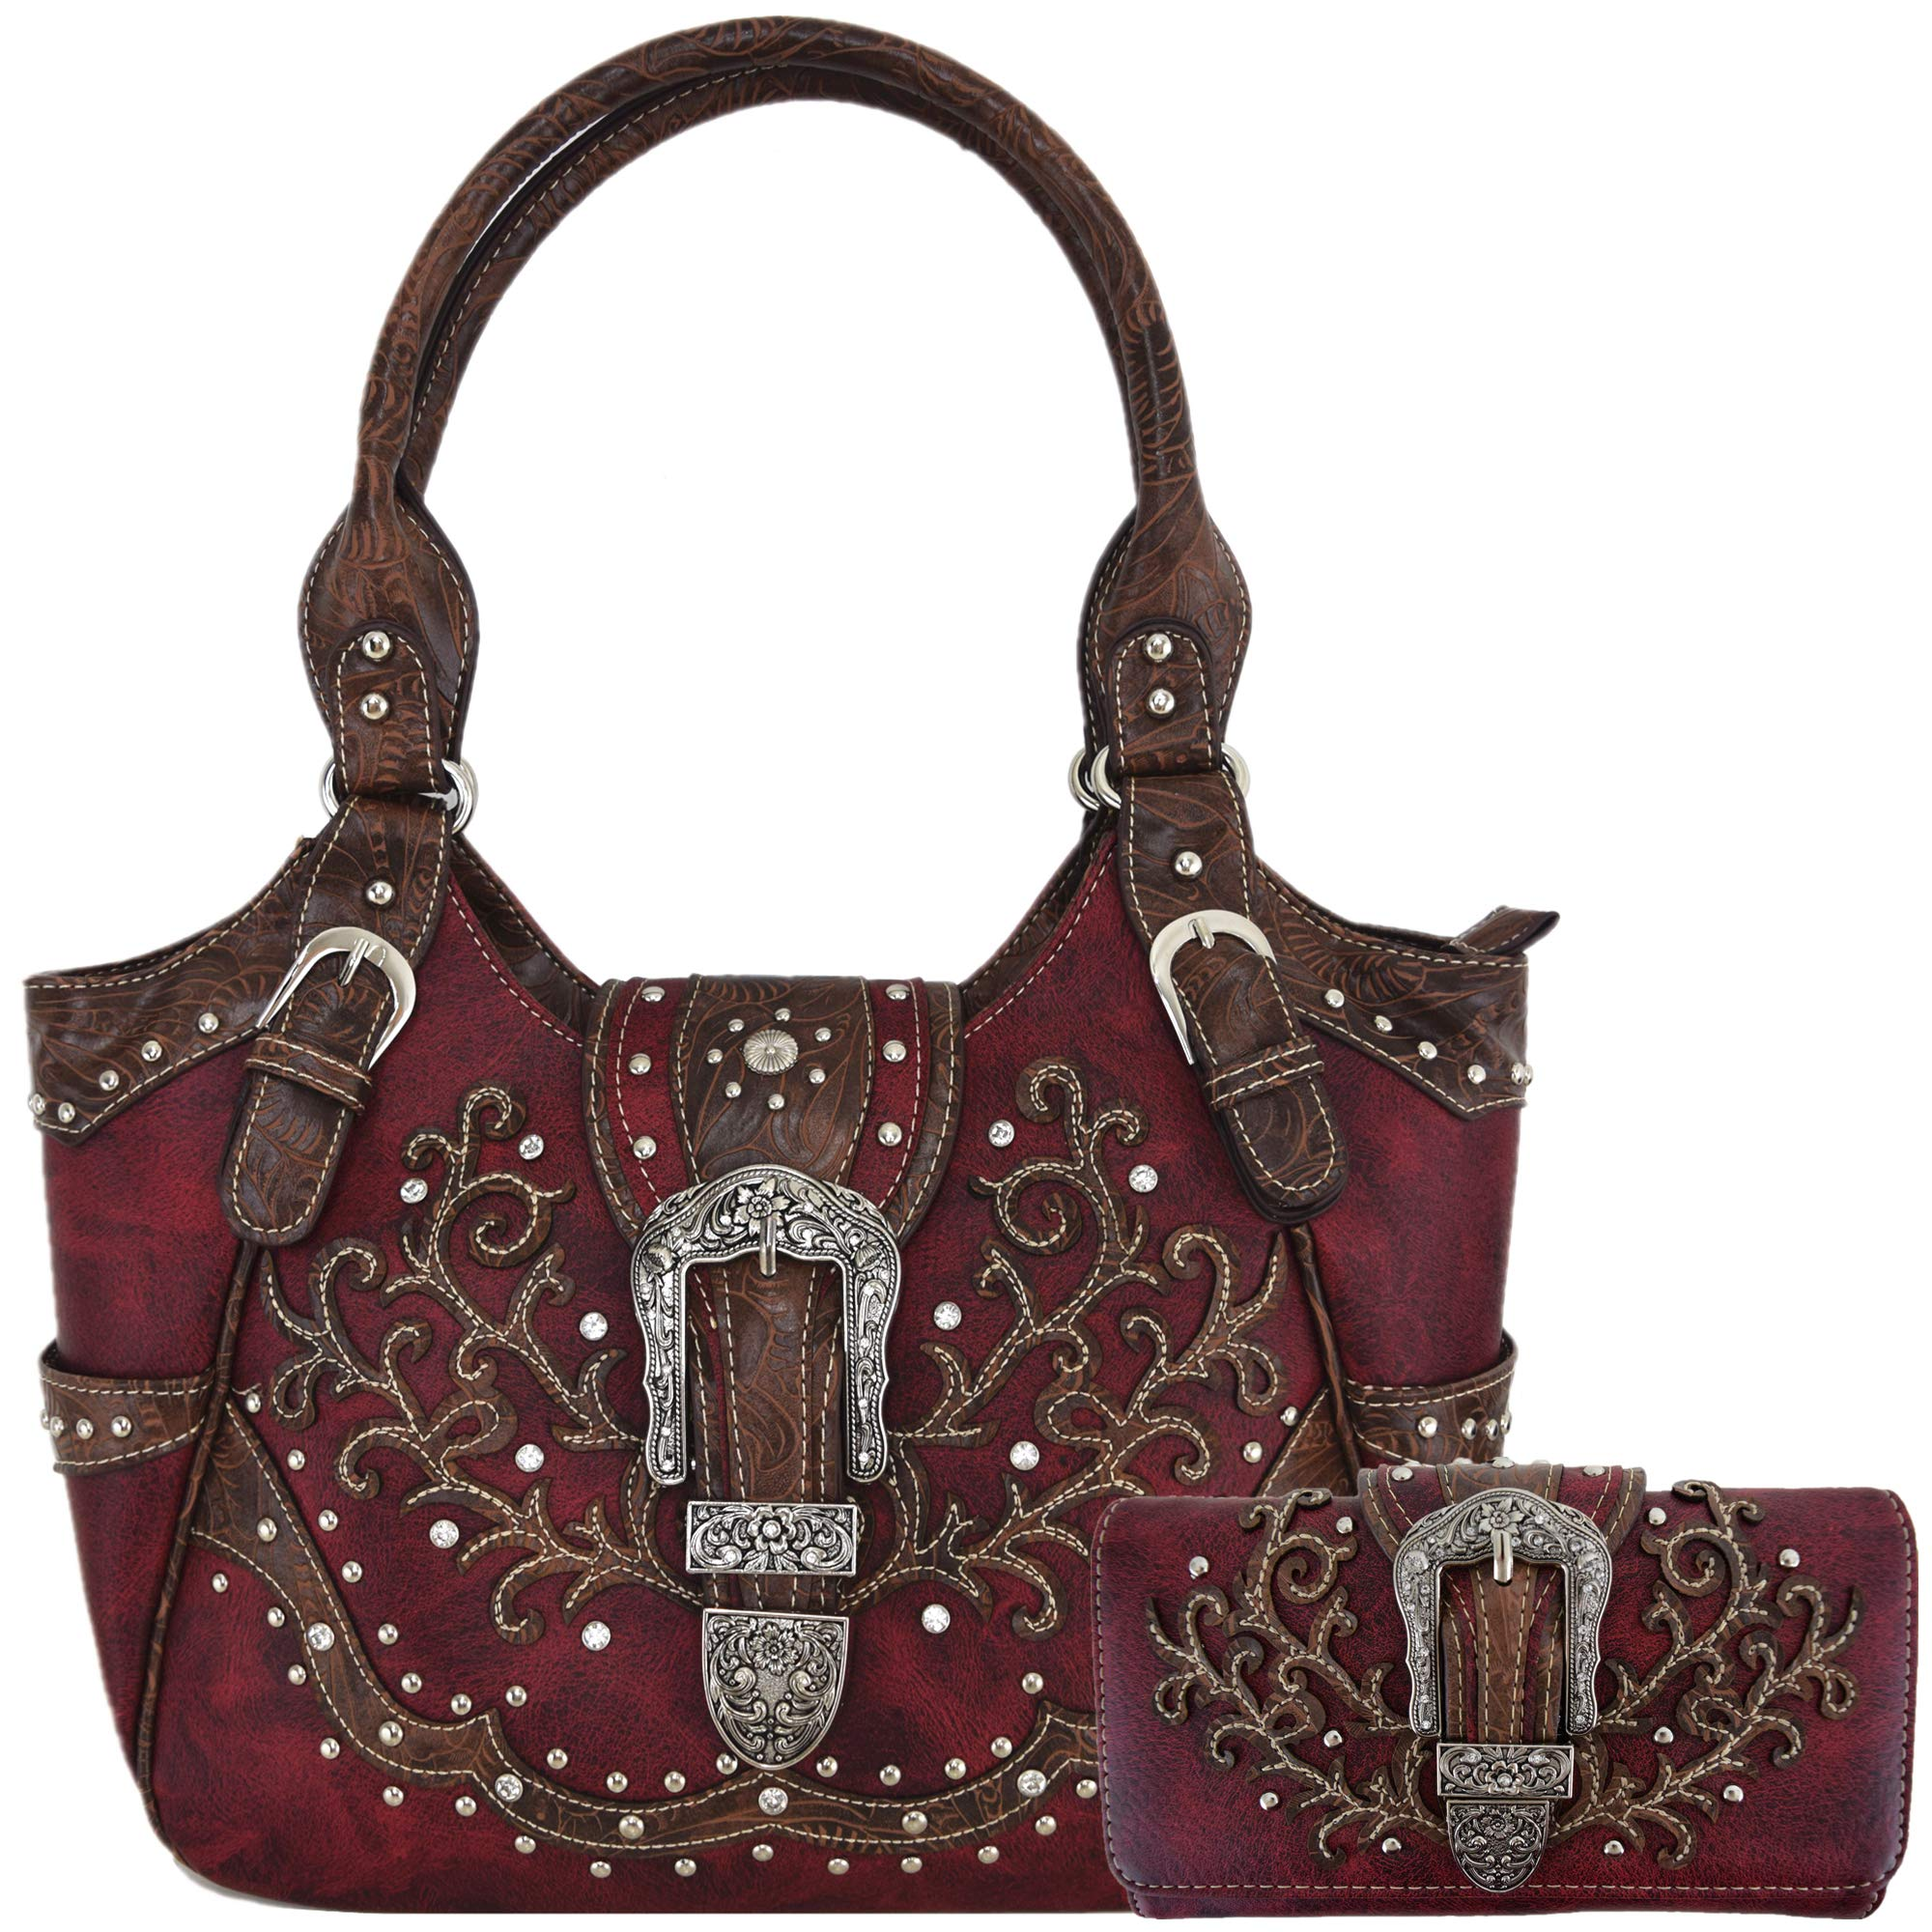 Western Style Tooled Leather Buckle Concealed Carry Purse Country Handbag Women Shoulder Bag Wallet Set (Red Set)